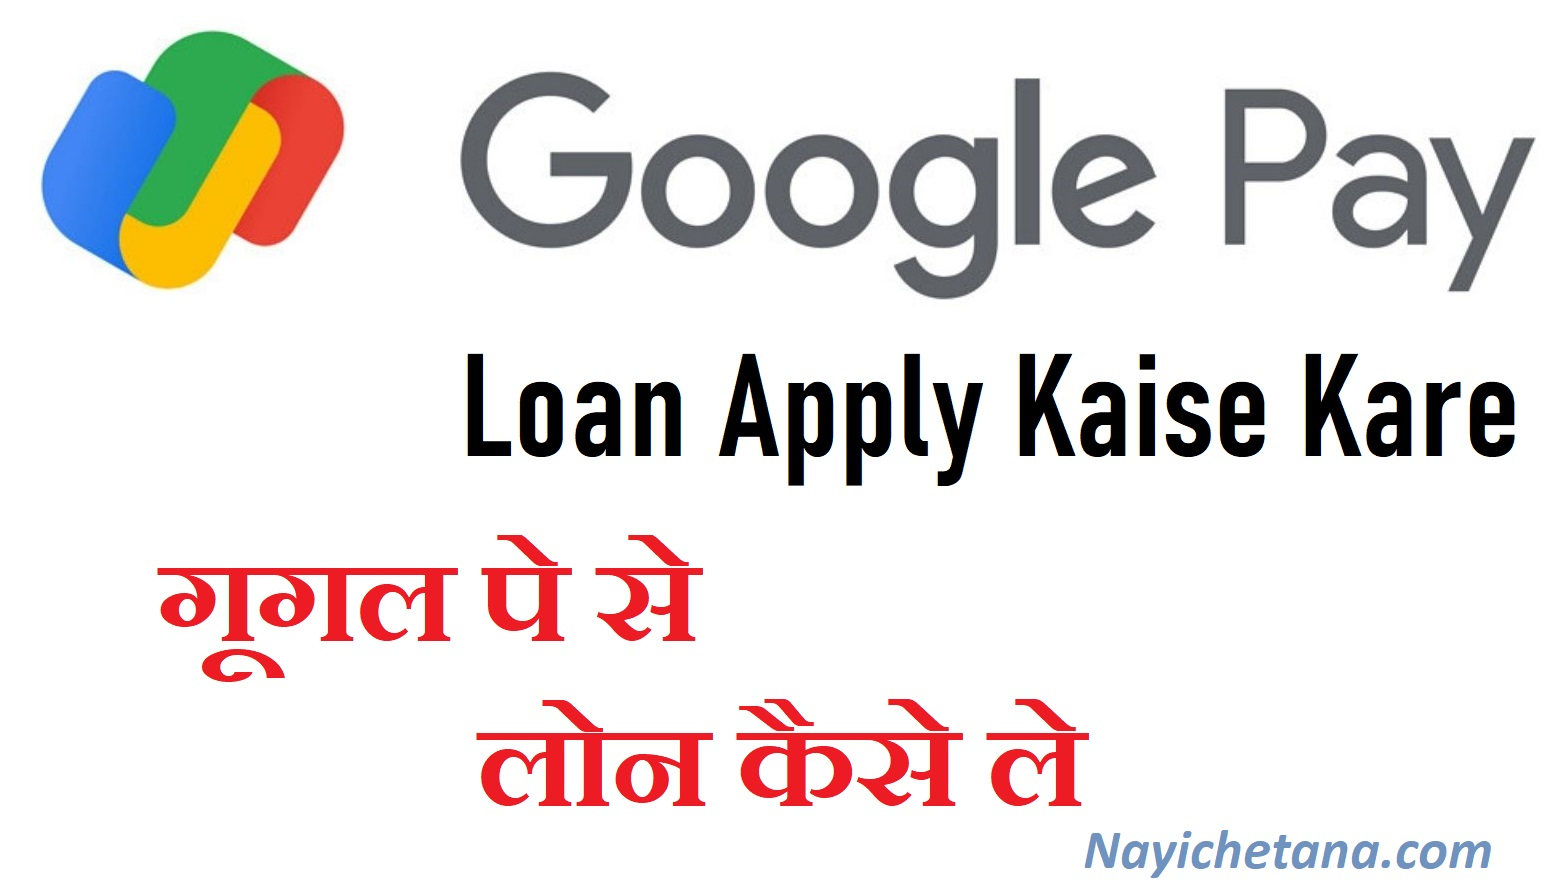 GP Se Loan Le,Google Pay se loan kaise le sakte hai,Google Pay Loan Apply in hindi,गूगल पे से लोन कैसे ले,Google Pay Se Loan Apply Kaise Kare